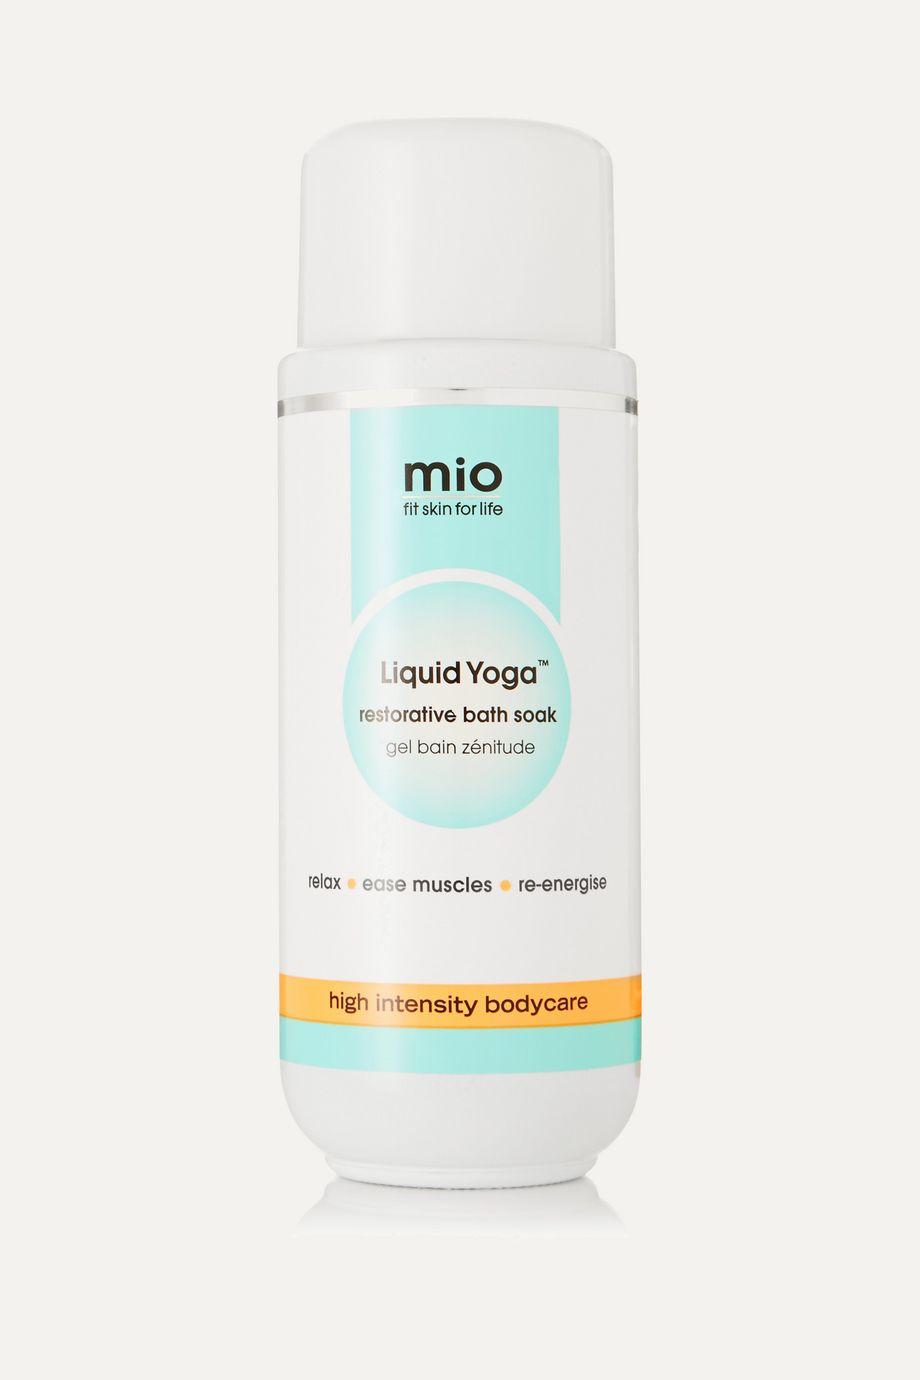 Mio Skincare Liquid Yoga Restorative Bath Soak, 200ml